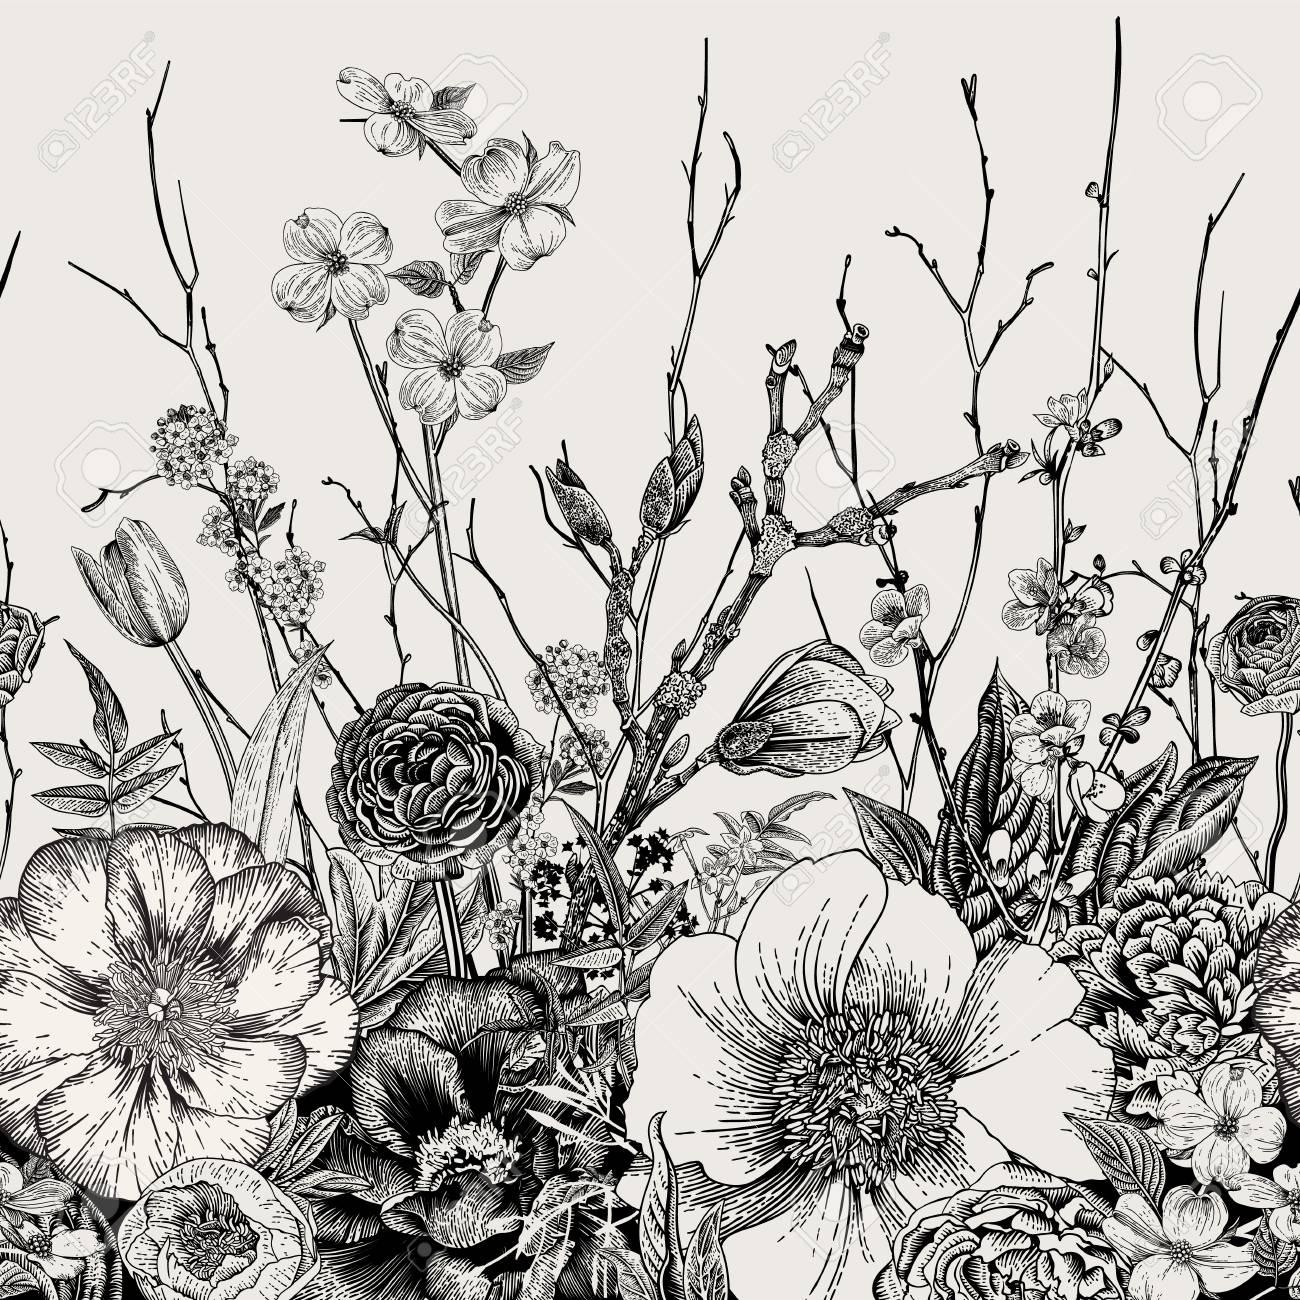 Seamless border. Spring Flowers and twig. Peonies, Spirea, Cherry Blossom, Dogwood. Vintage botanical illustration. Black and white - 96594262